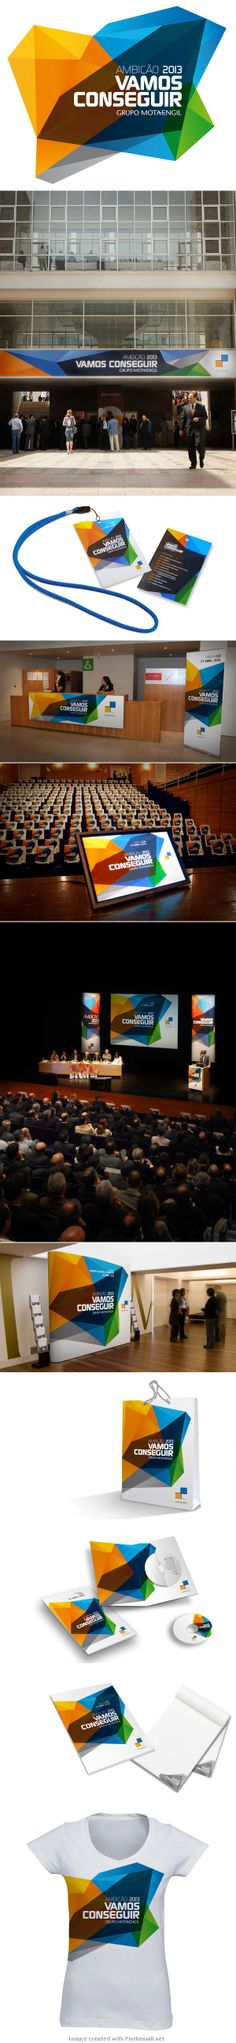 Mota Engil - board meeting